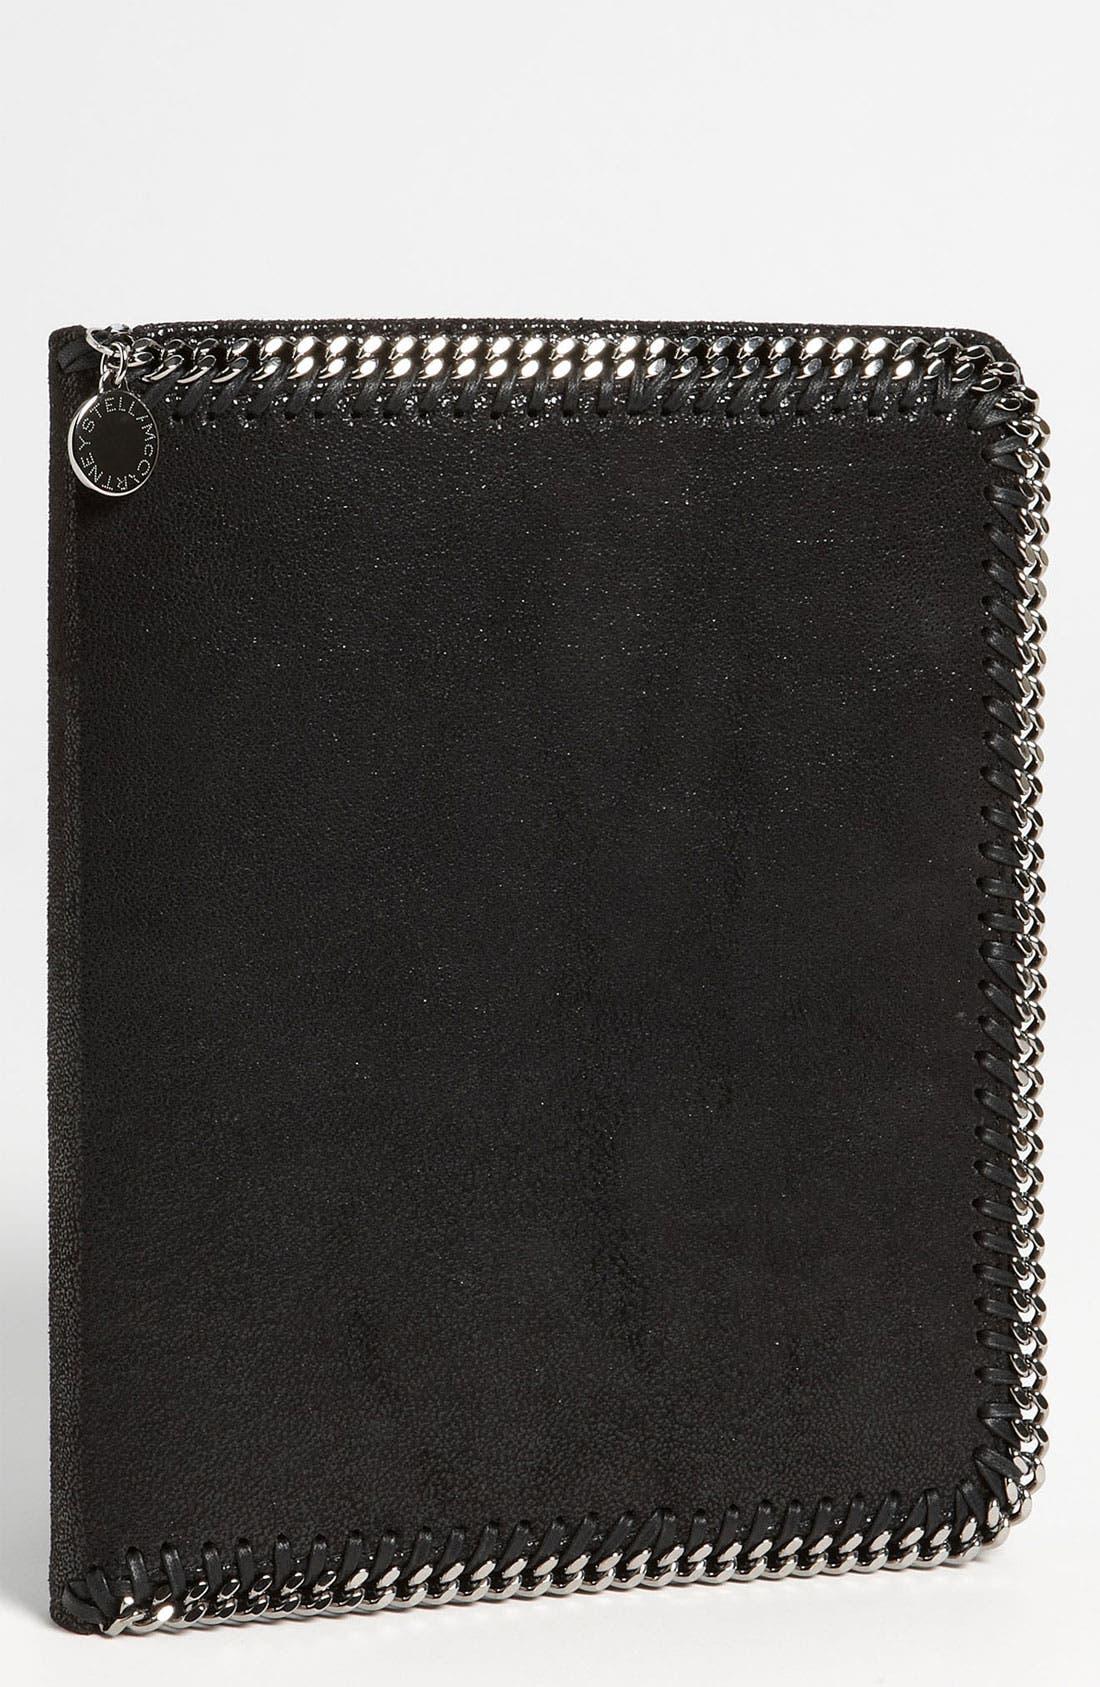 Main Image - Stella McCartney 'Falabella' iPad Case